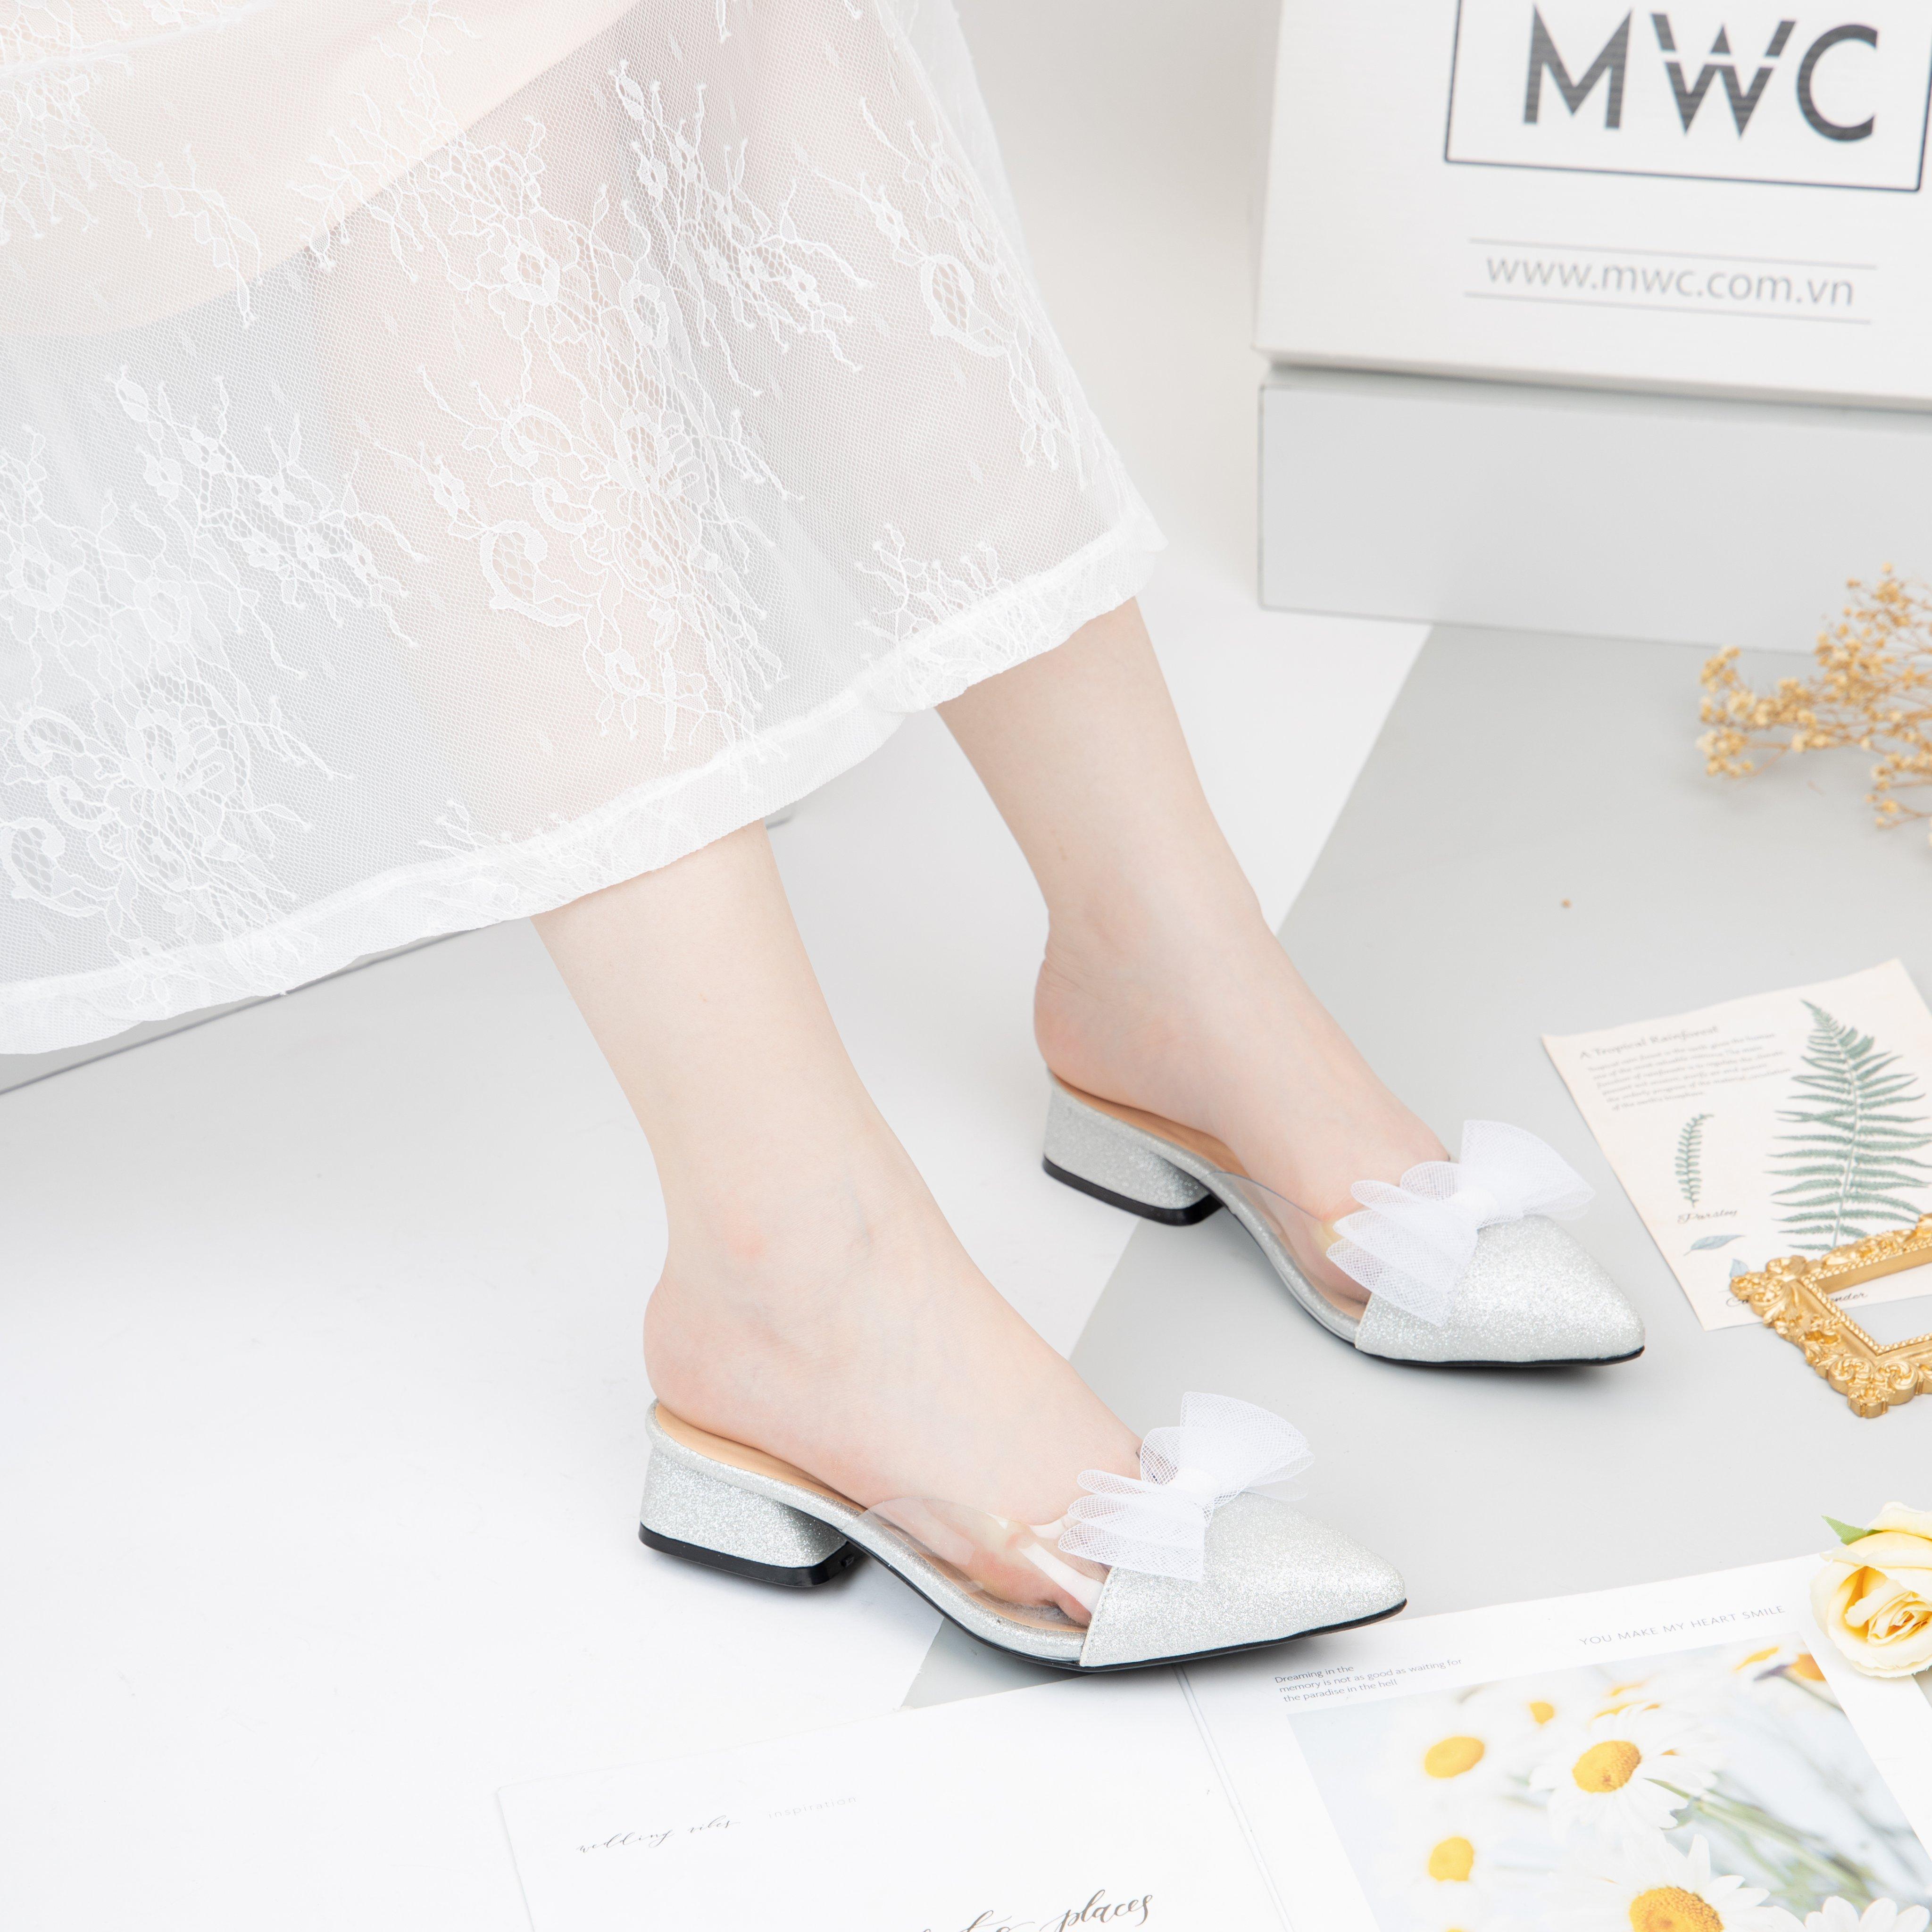 Giày cao gót MWC NUCG-4111